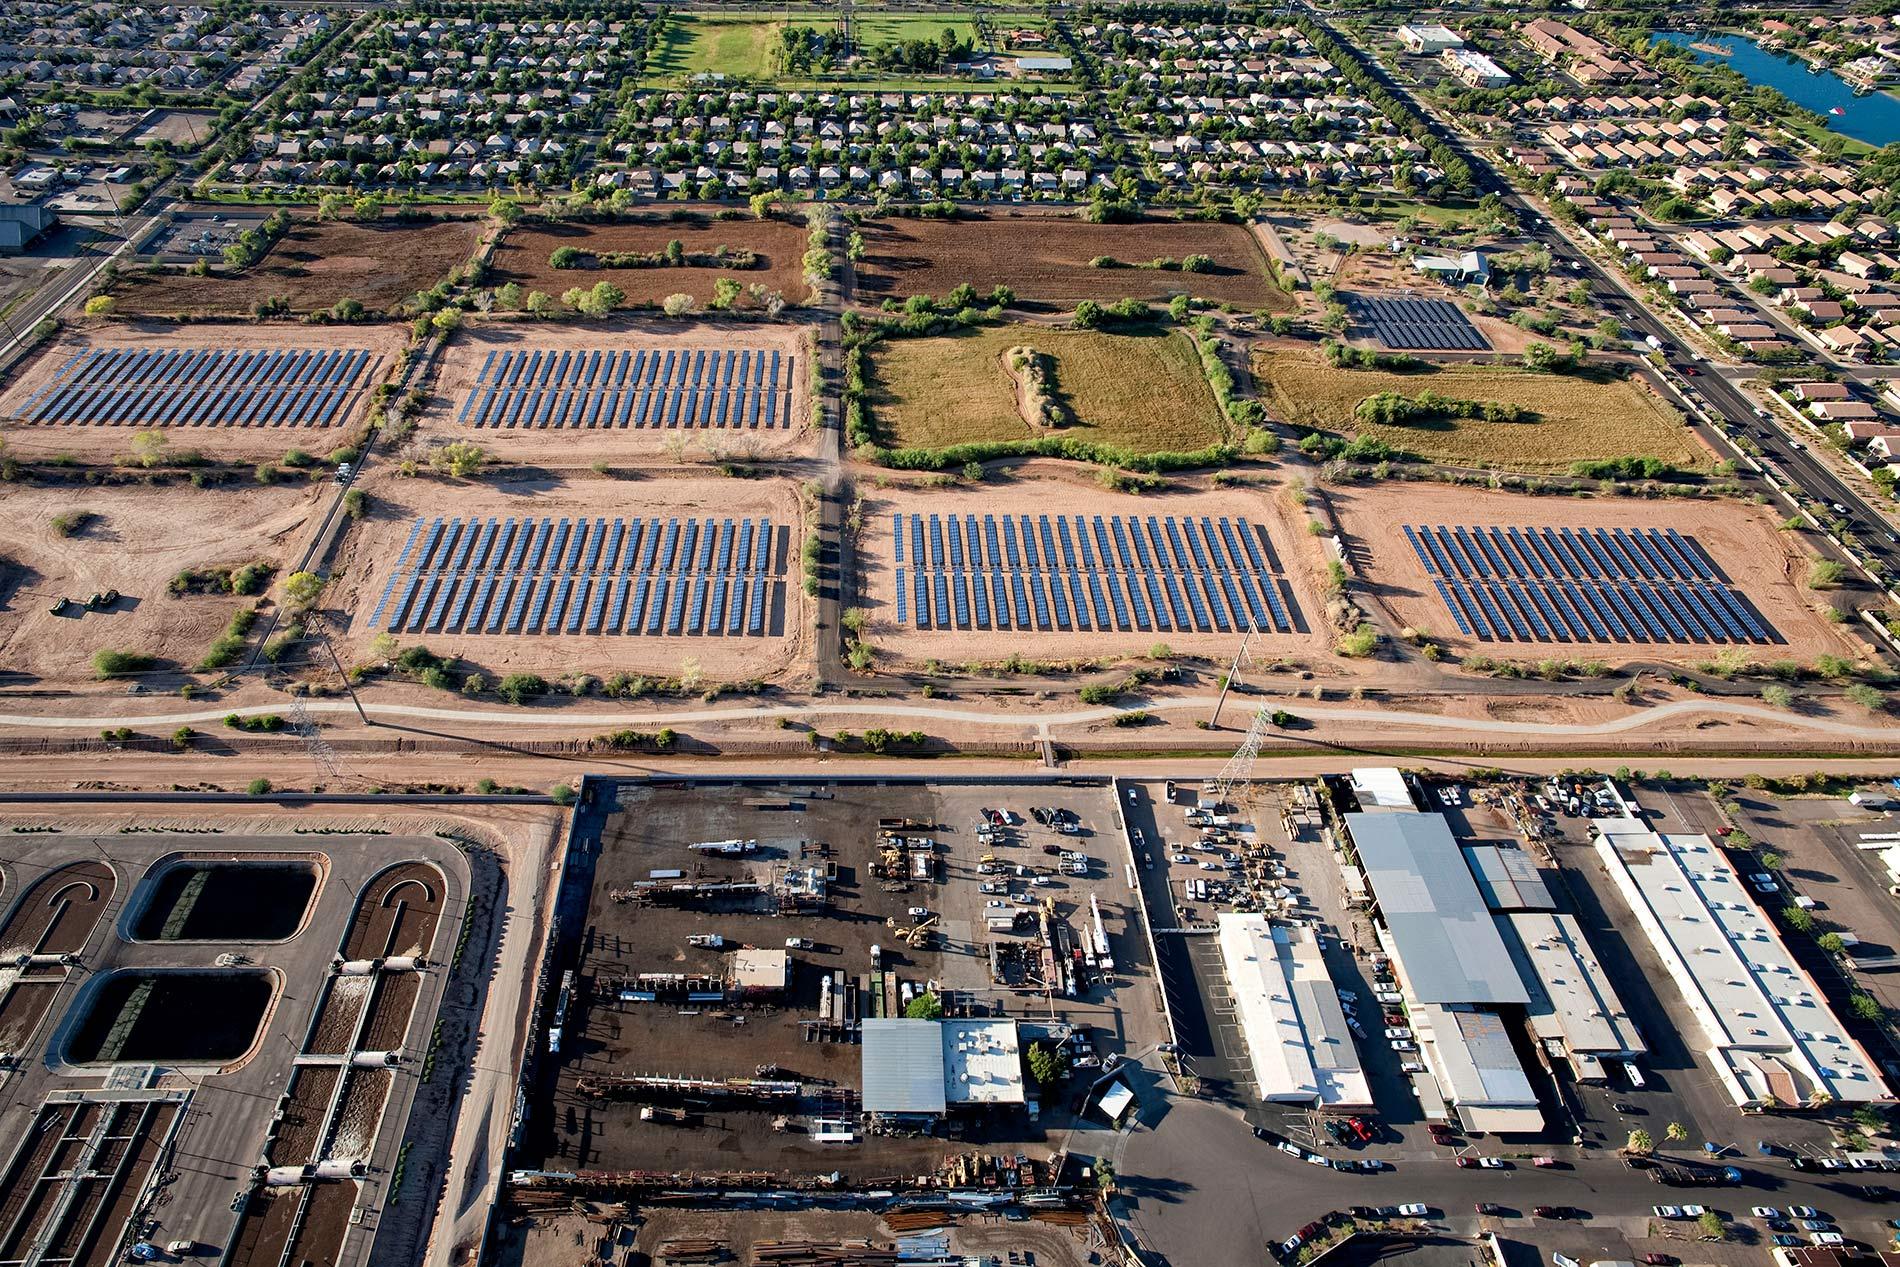 Heritage Park in Gilbert, Arizona